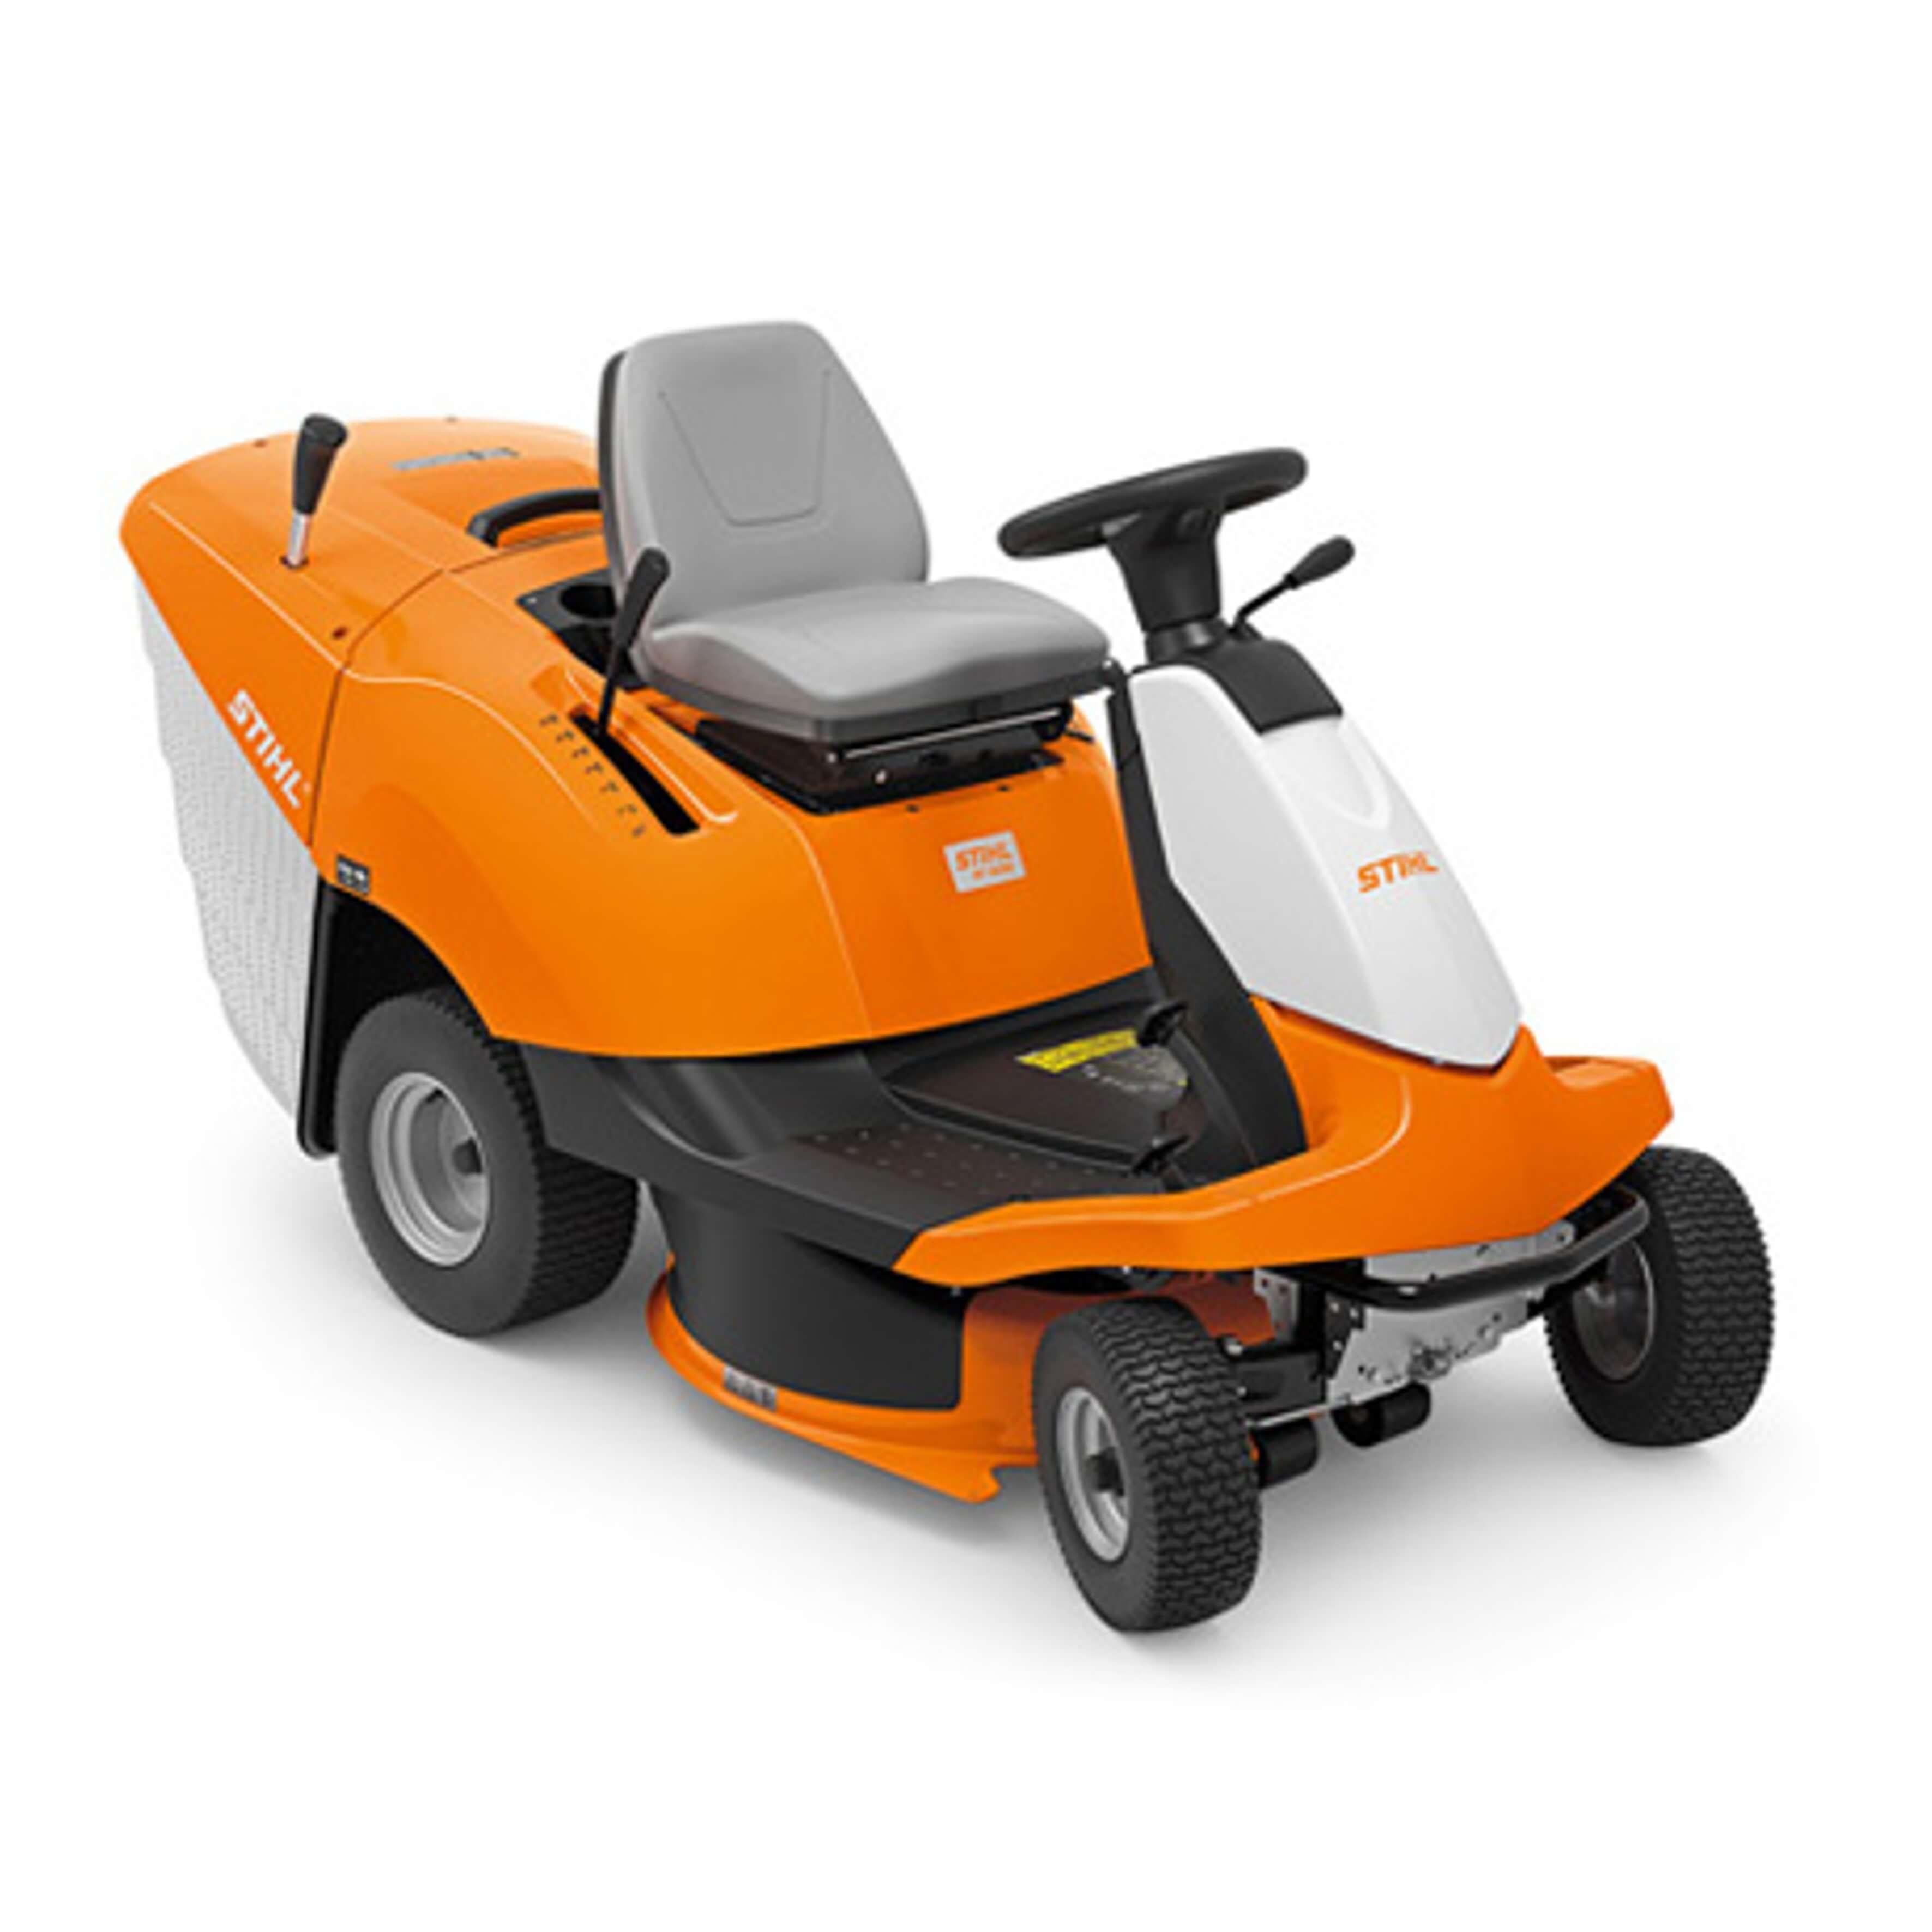 Stihl R Series Ride on Mower Parts